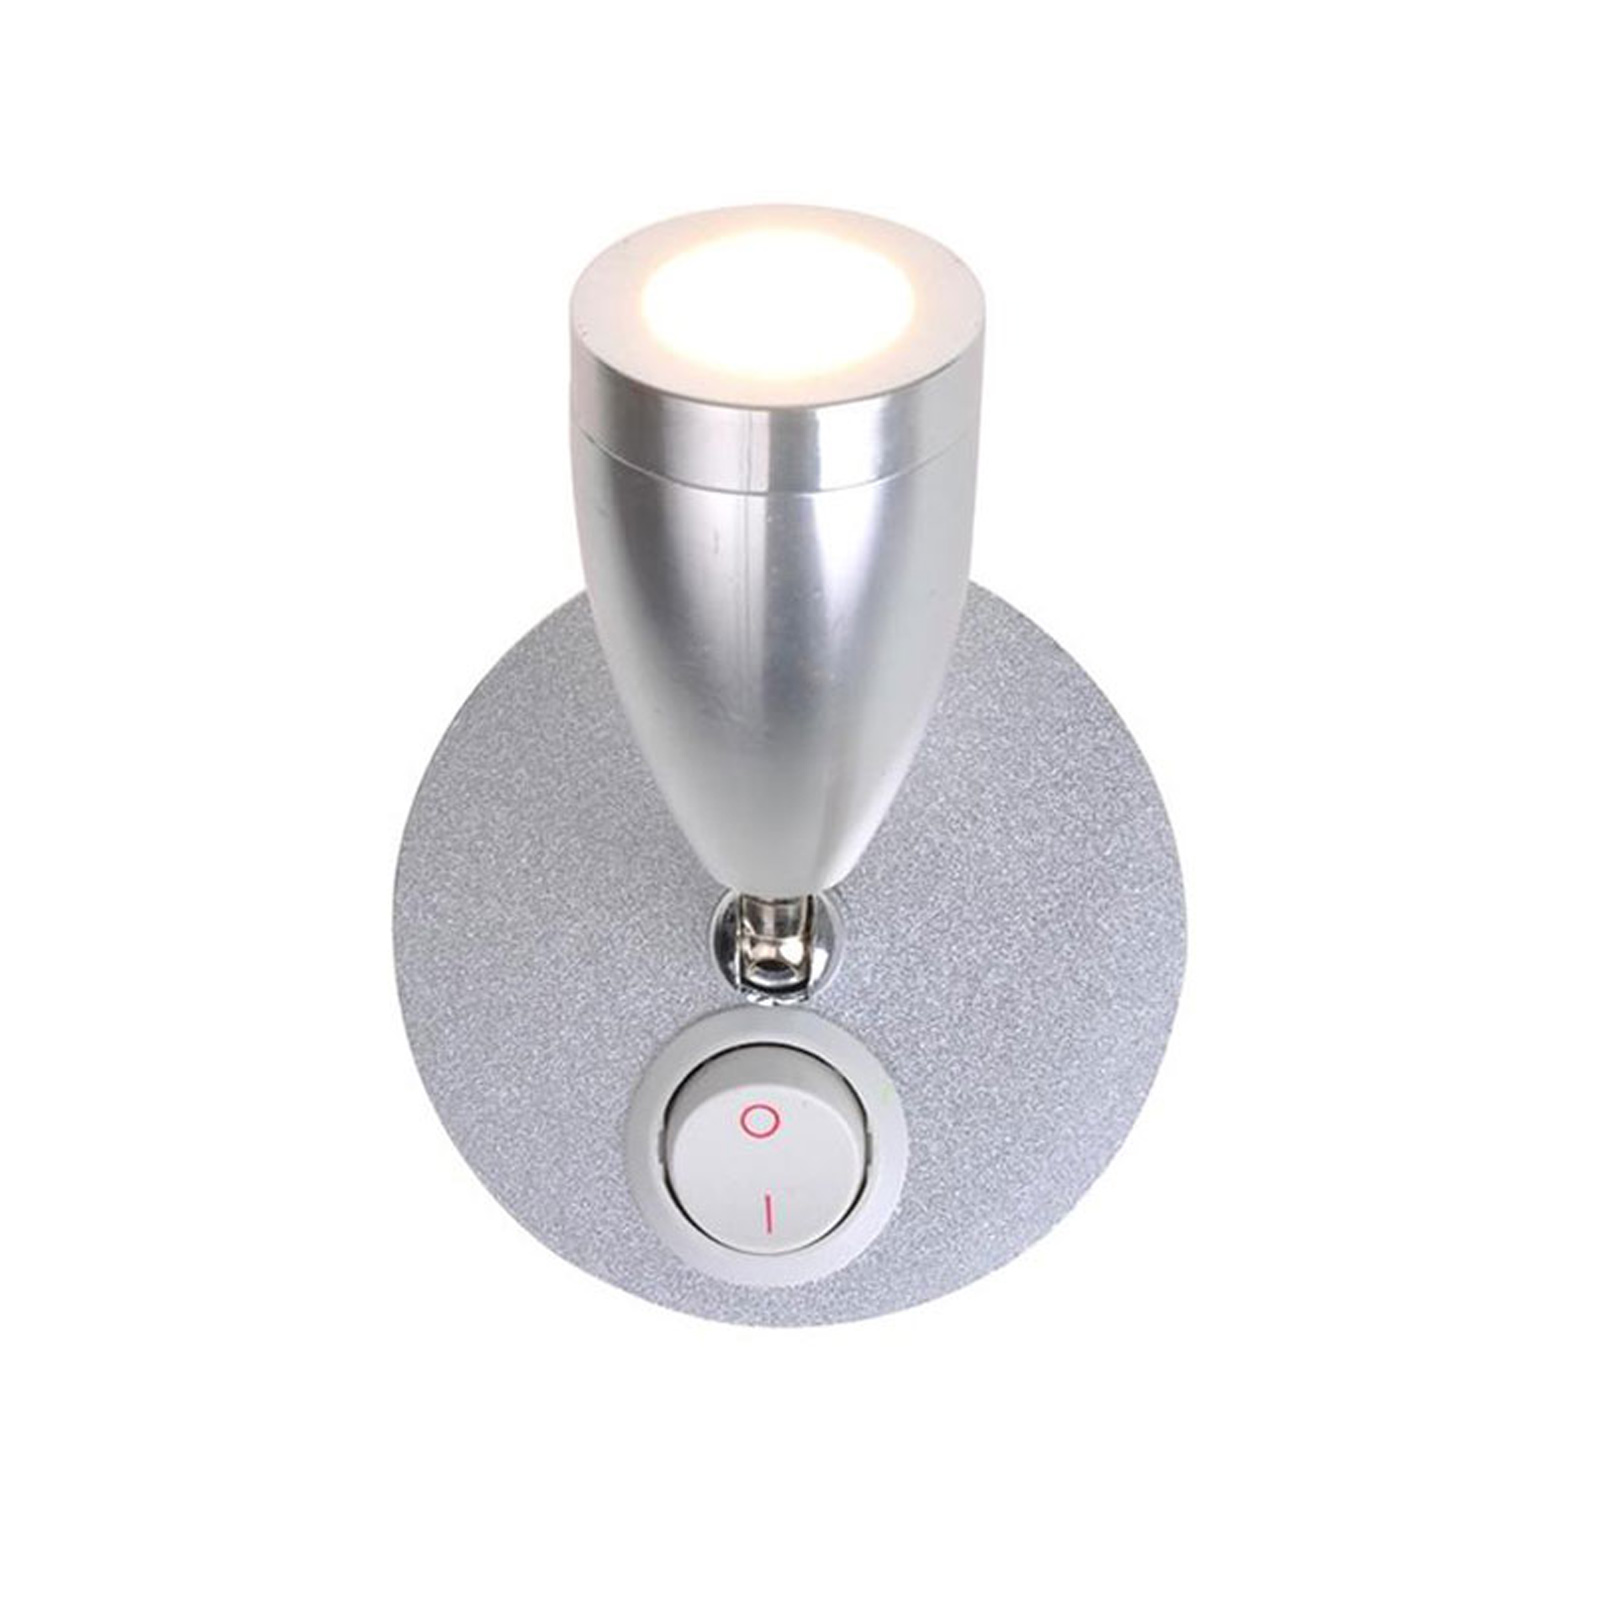 Aufbauspot 1 LED schwenkbar 12v, 160lm, Ø65x70-110mm